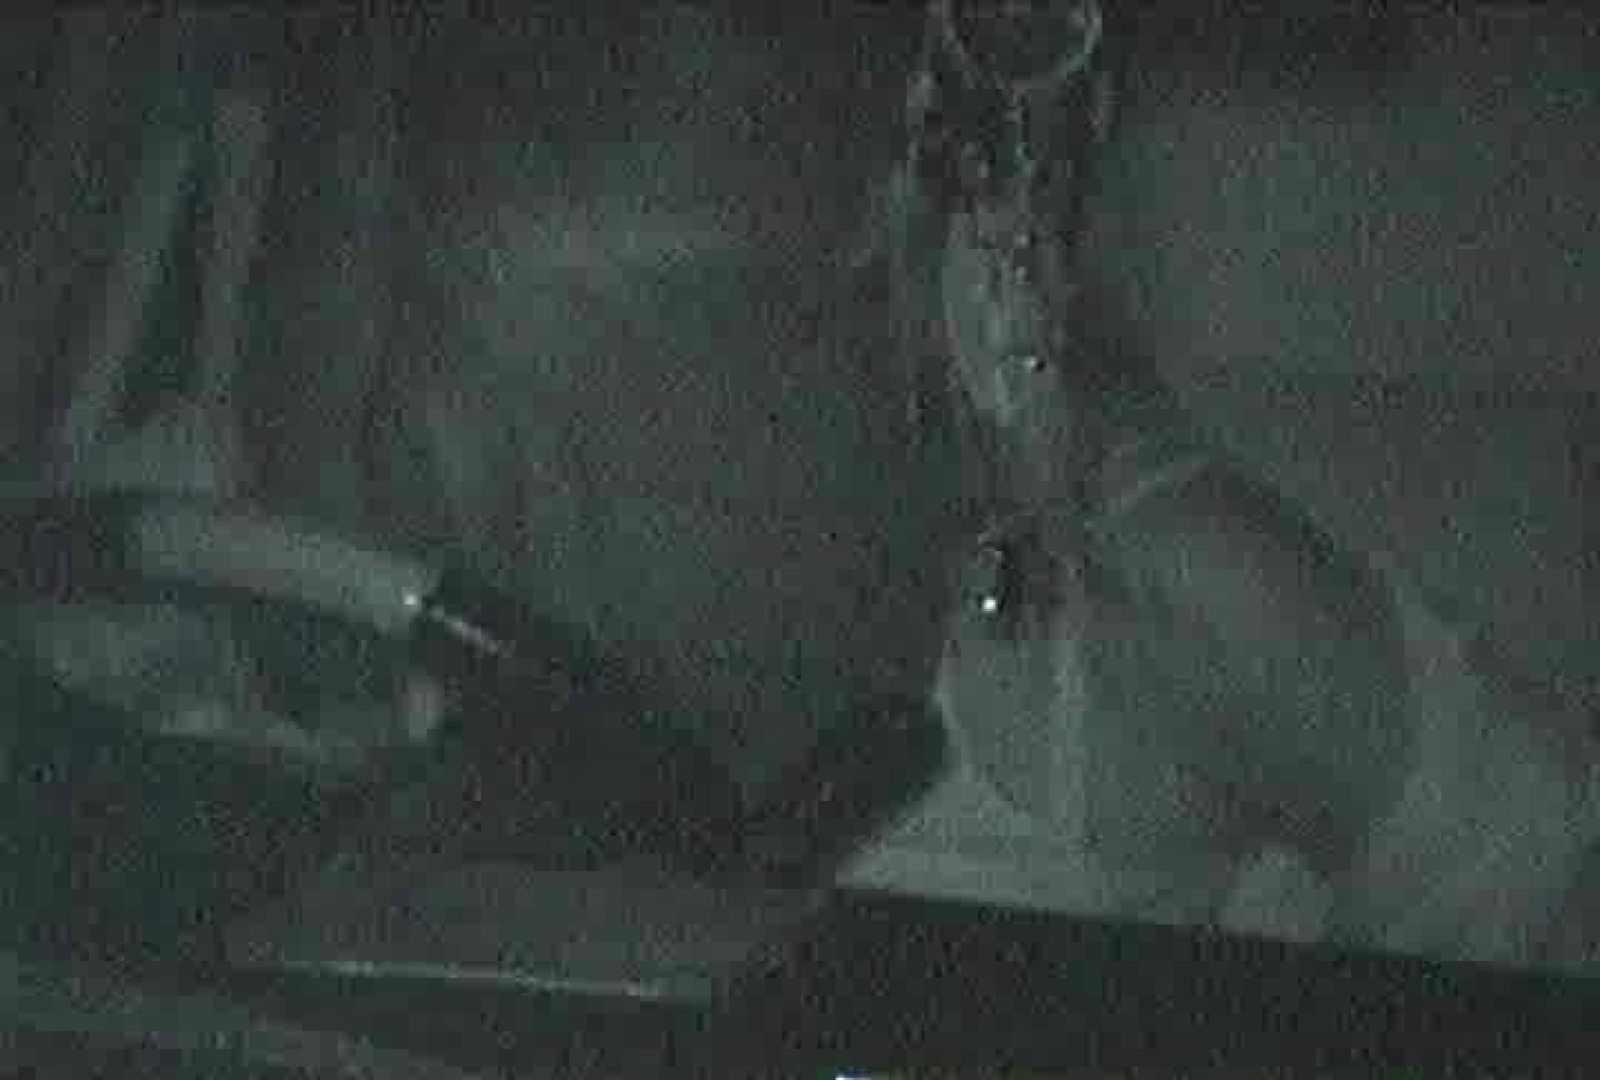 充血監督の深夜の運動会Vol.99 美女OL オメコ無修正動画無料 67連発 14